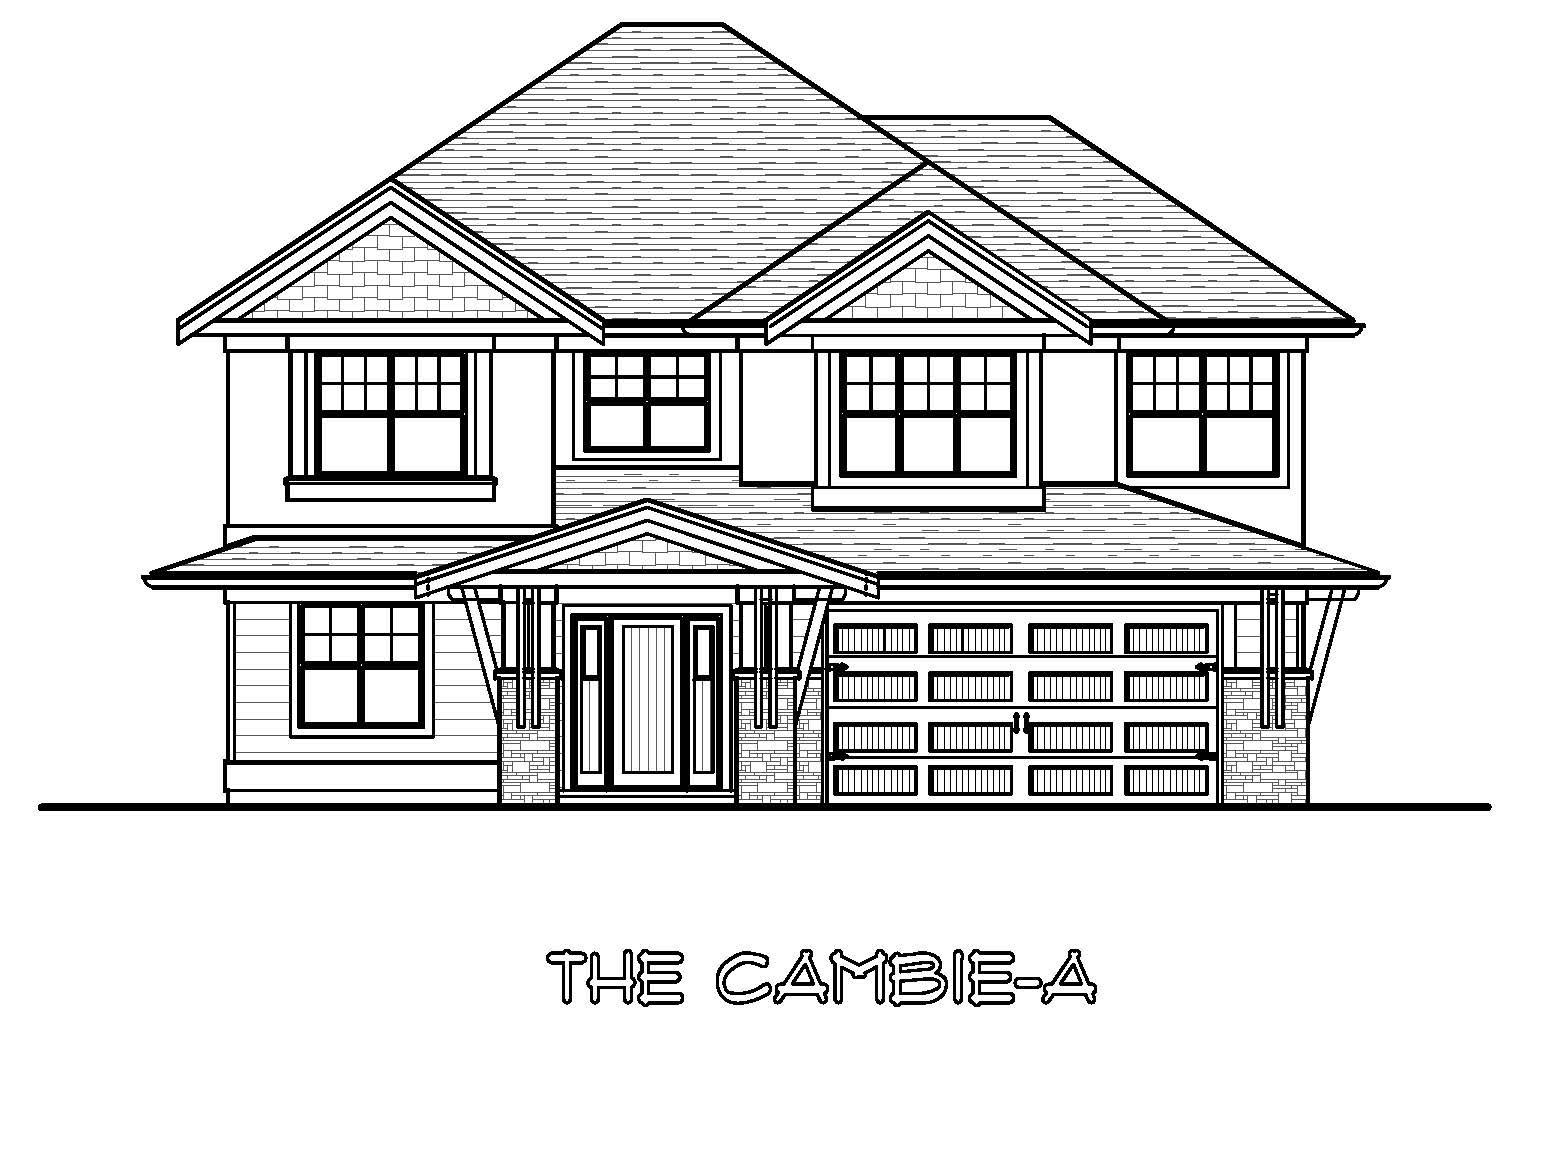 The Cambie - Custom Home Floor Plan 1